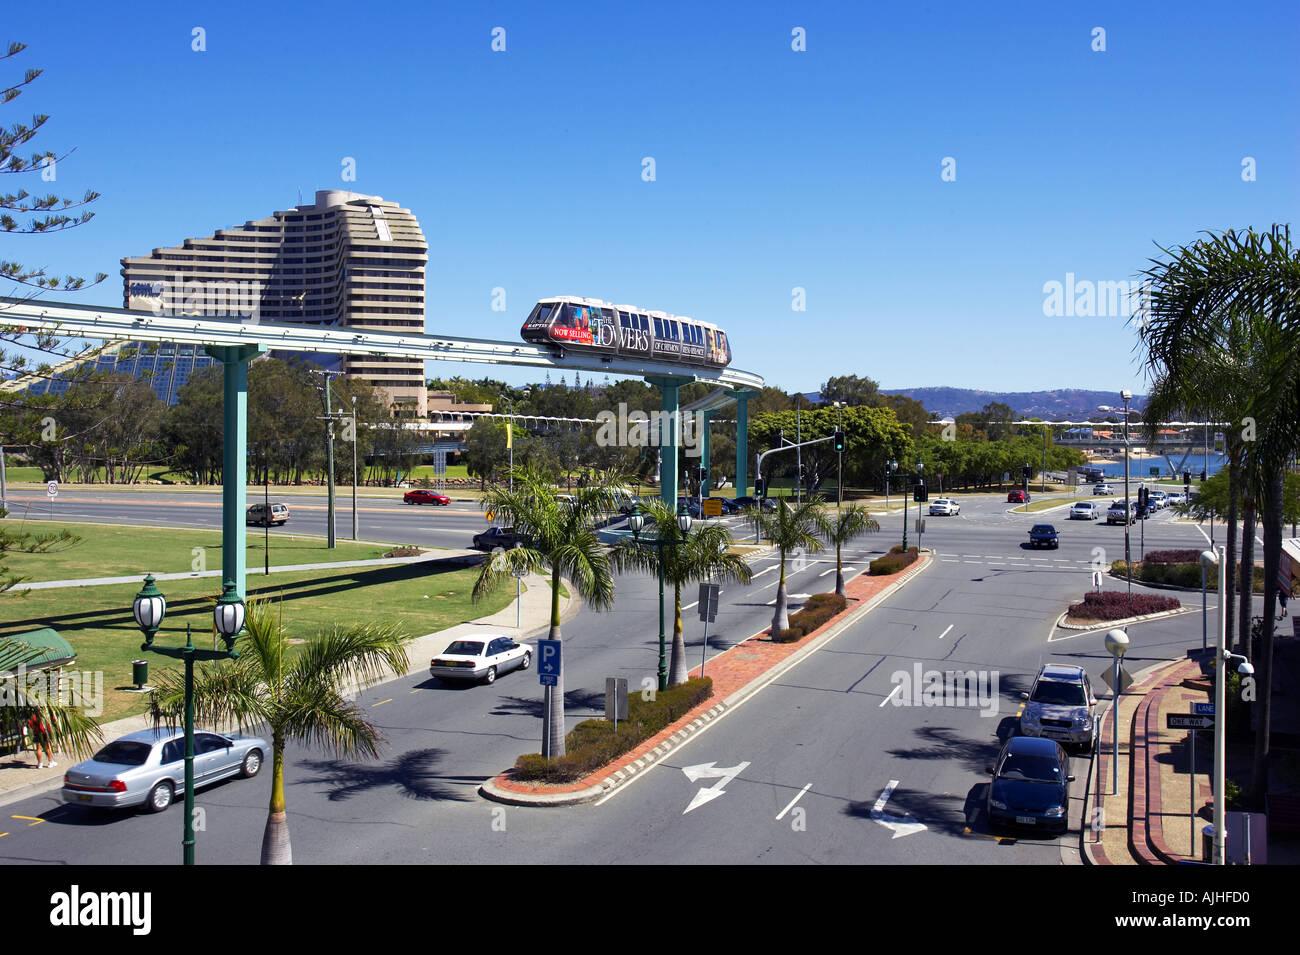 jupiters casino queensland